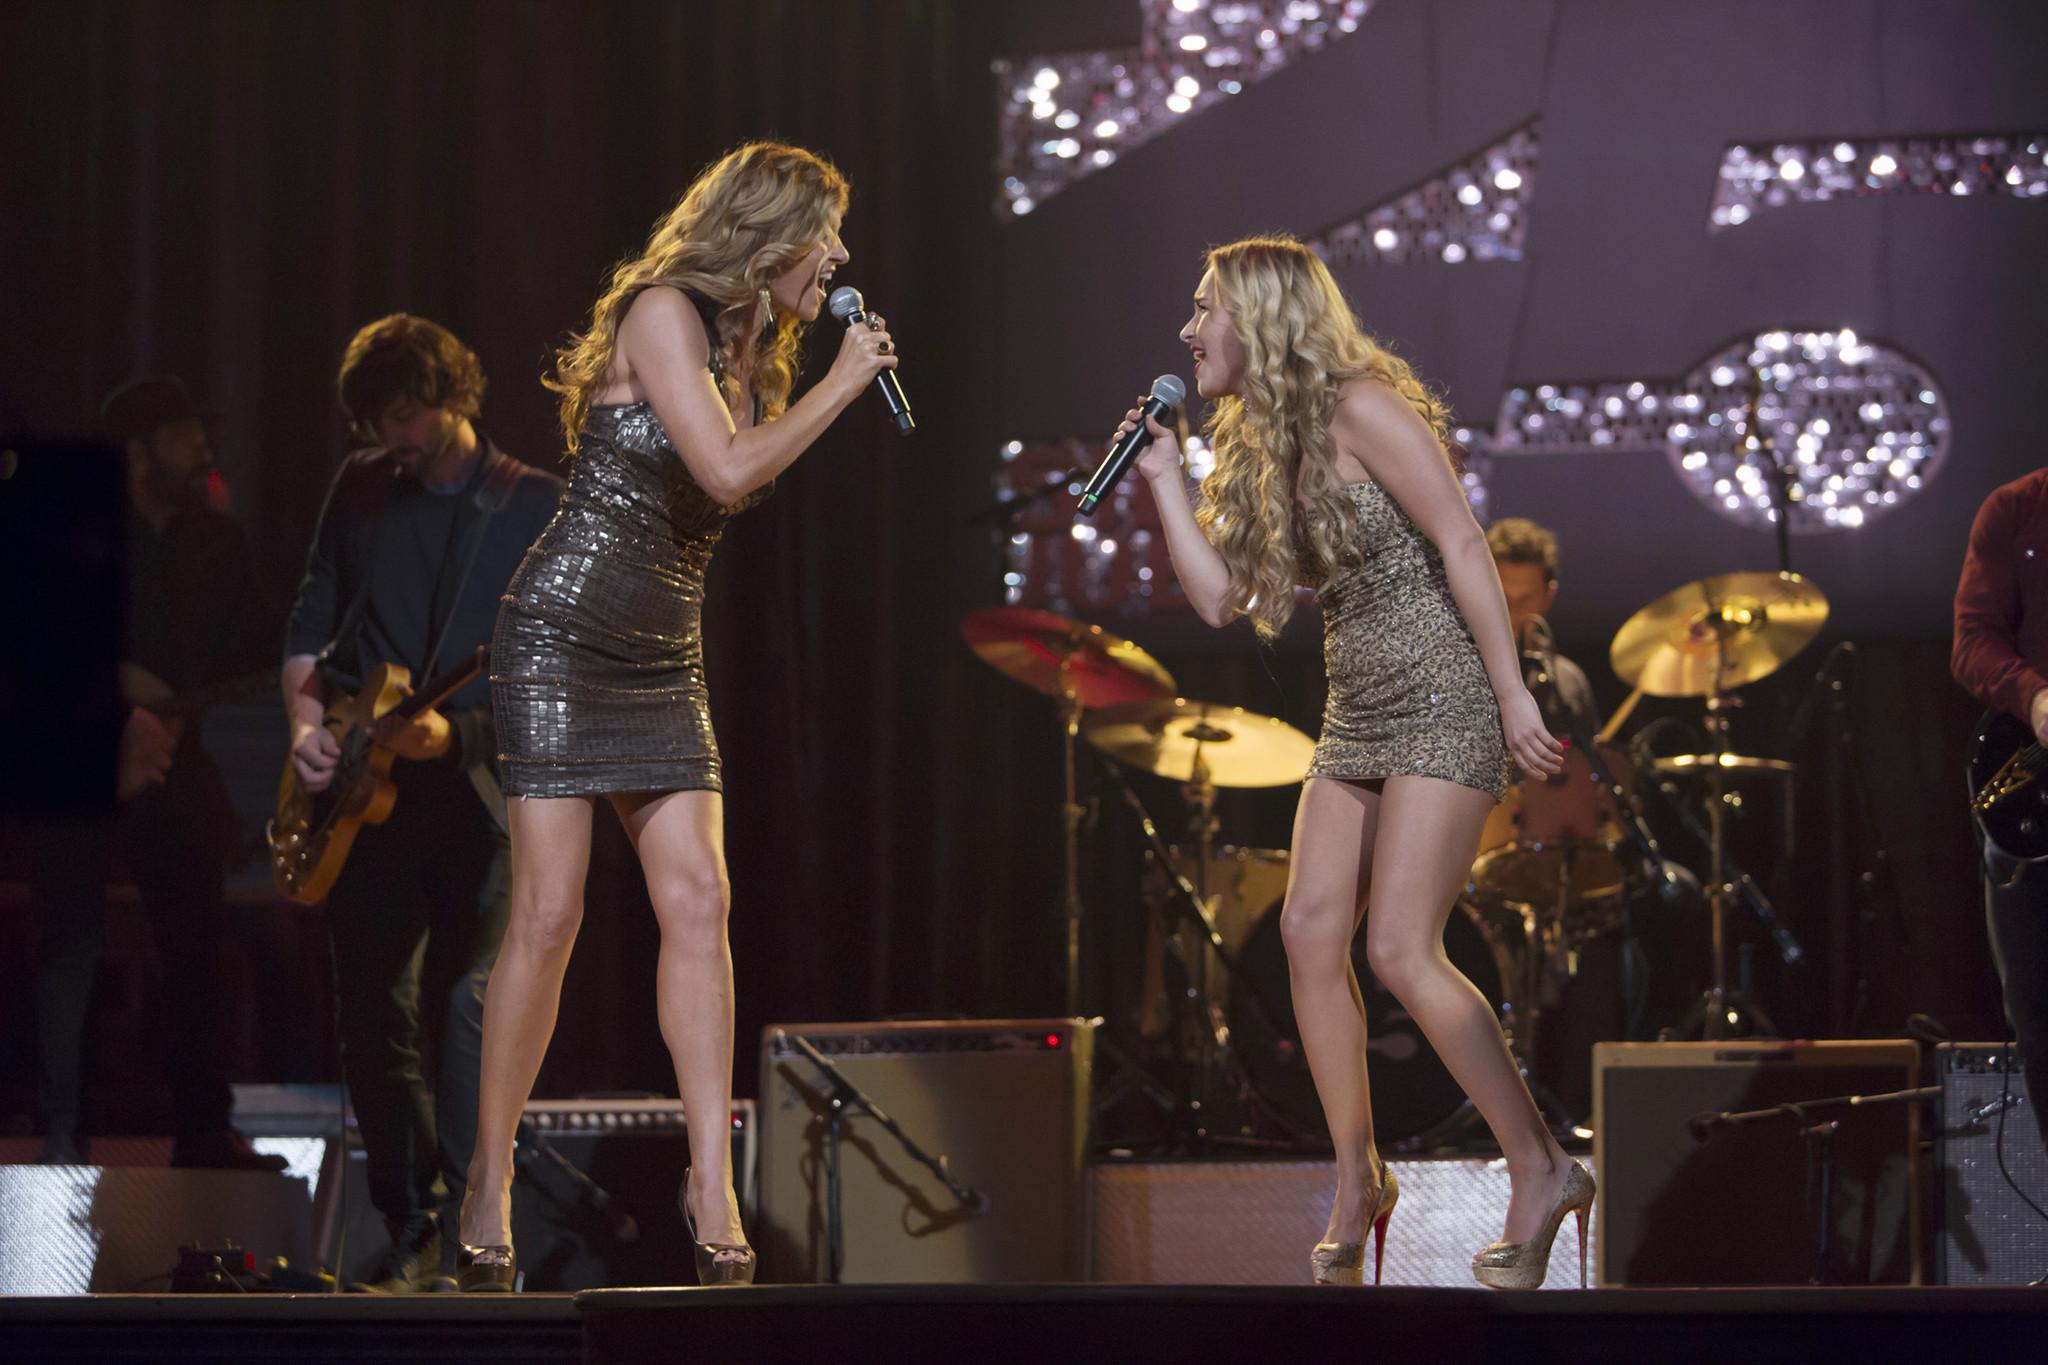 ABC renews 'Nashville' for a third season - Capital Gazette